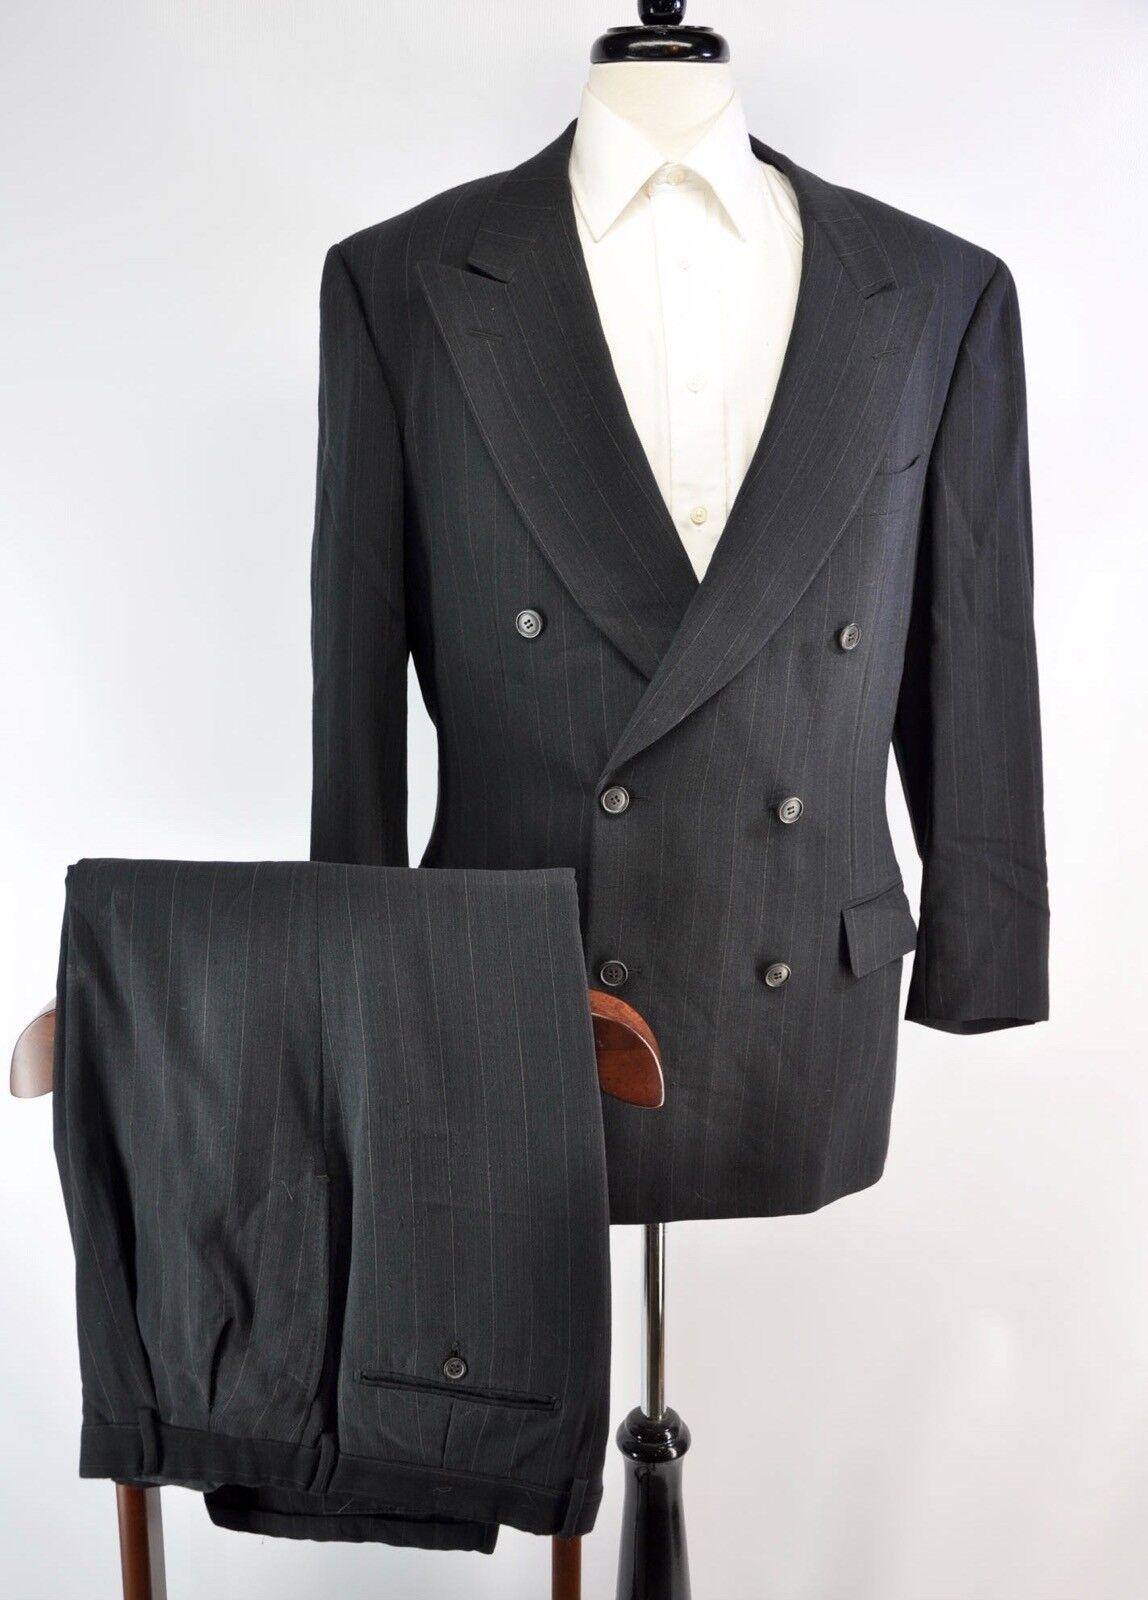 Ermenegildo Zegna Charcoal grau Double Breasted Peak Lapel Stripe Wool Suit 42R